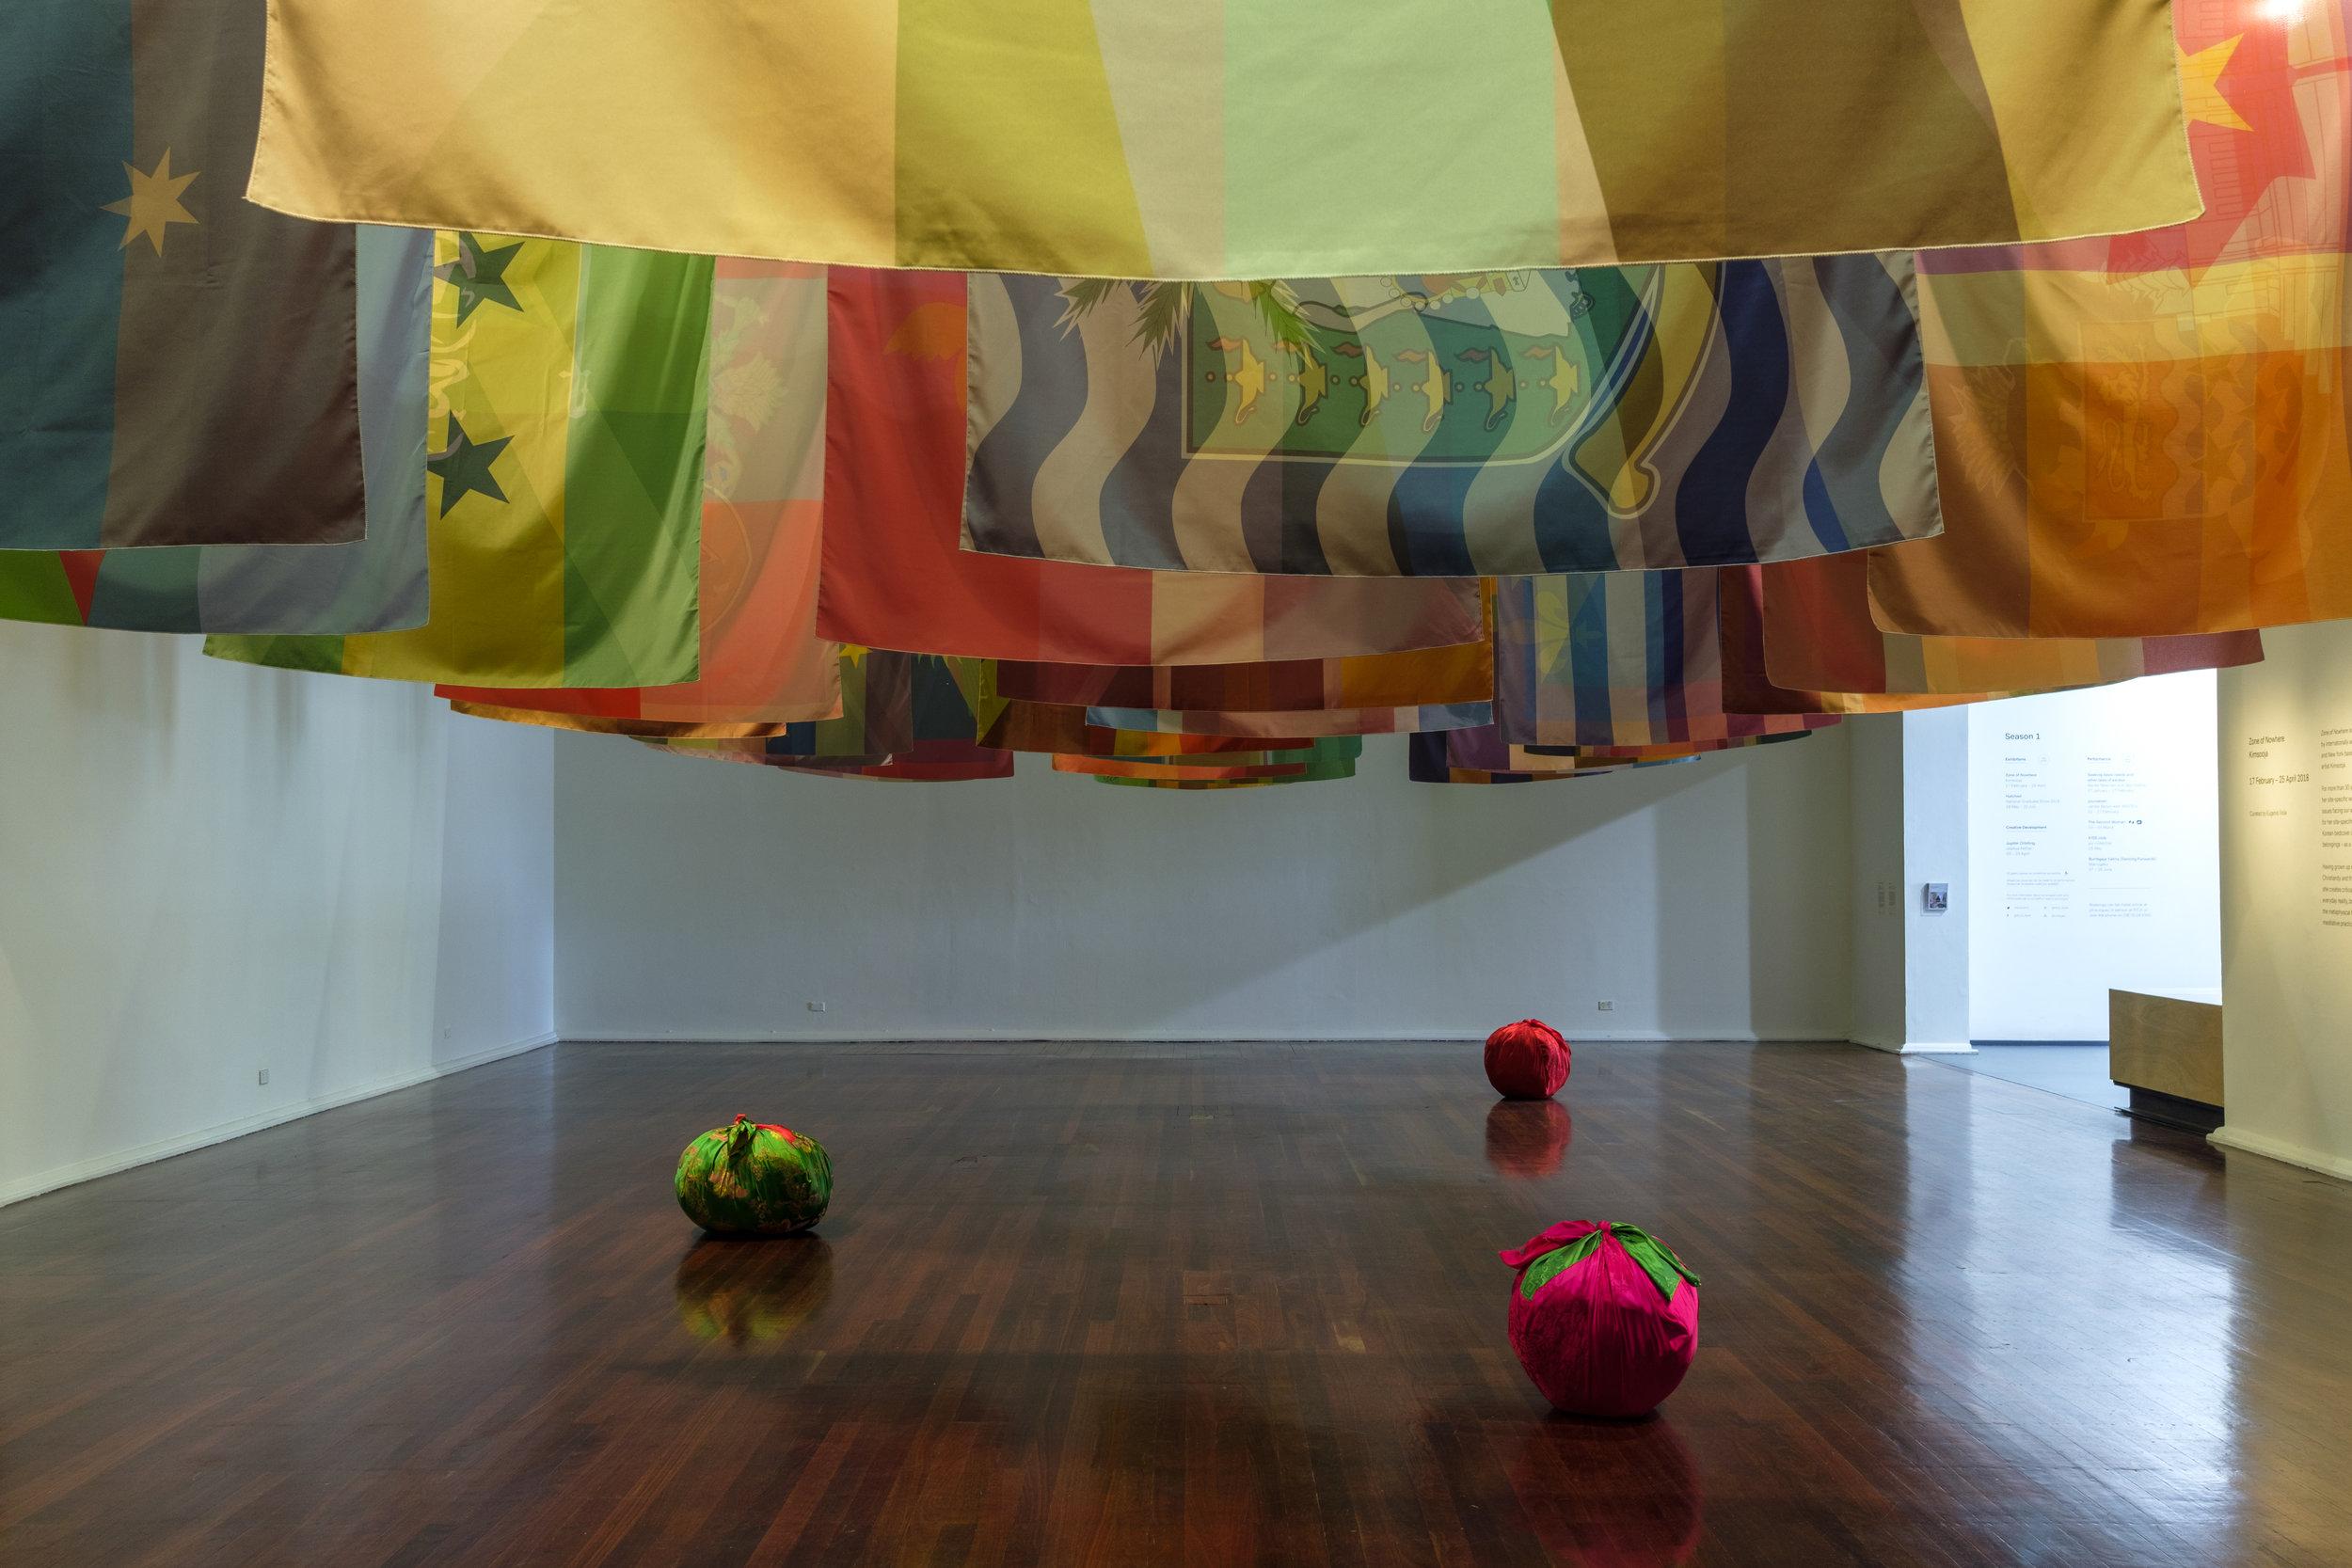 Kimsooja,  To Breathe – Zone of Nowhere  and  Bottari,  2018; installation detail view, Perth Institute of Contemporary Arts (PICA), 2018; site-specific installation; image courtesy PICA, Perth; photo: Alessandro Bianchetti